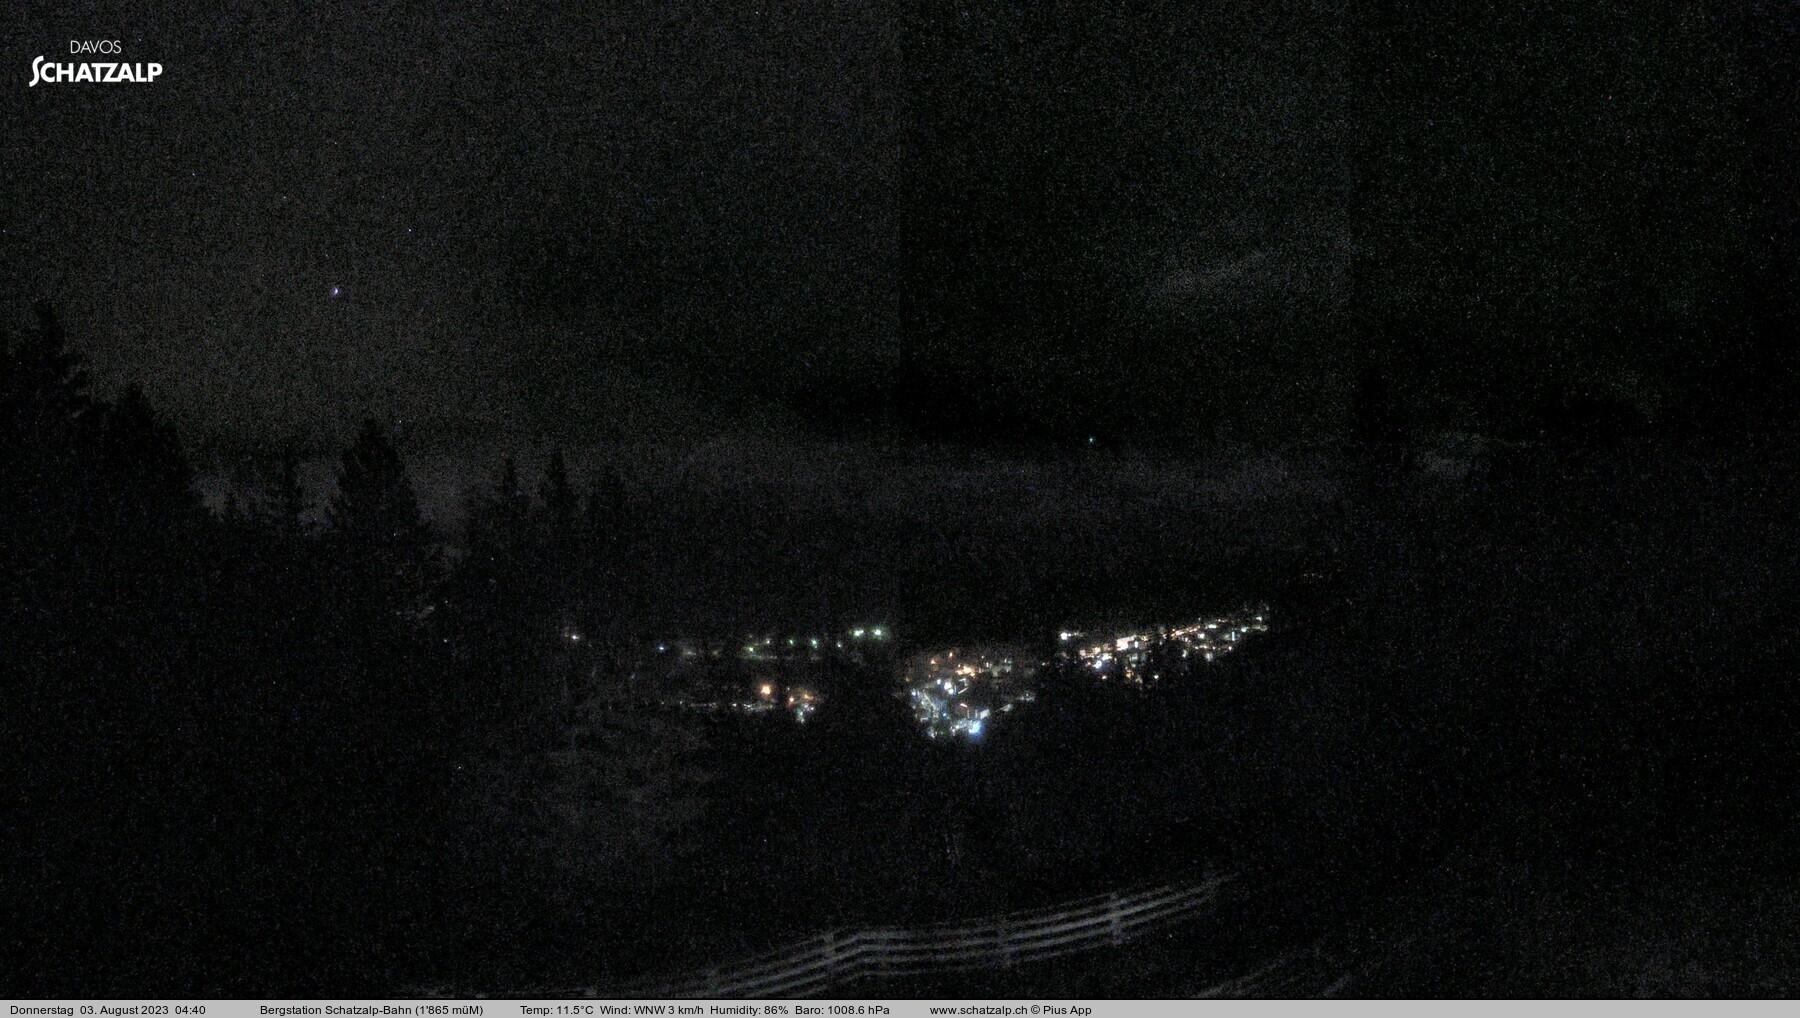 Schatzalp-Bahn Davos